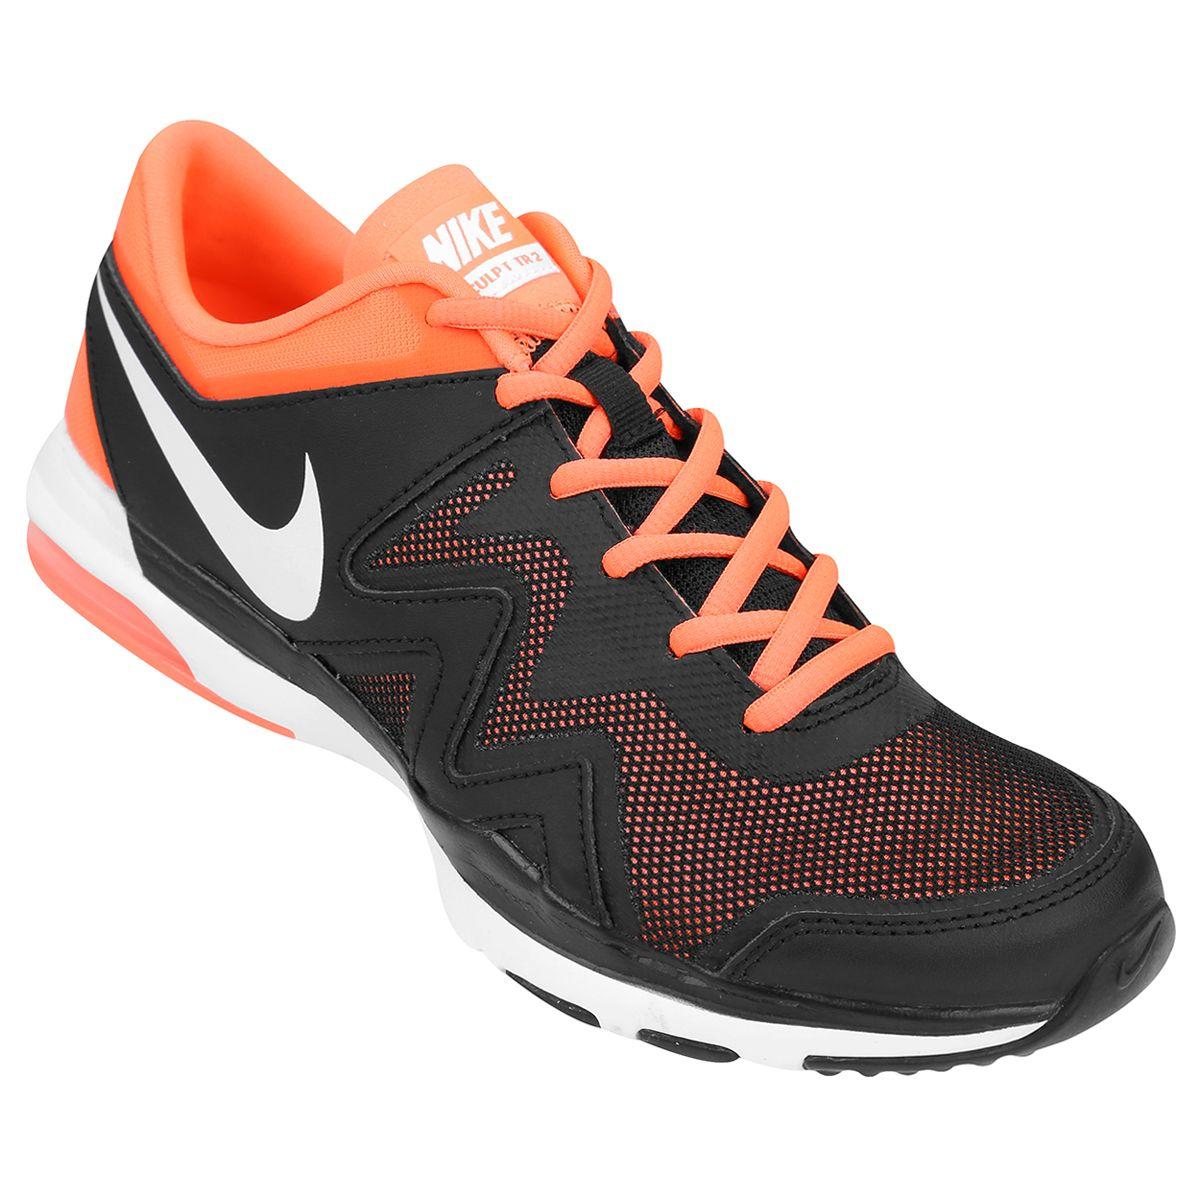 9e5f0c88a0 ... Zapatillas Nike Air Sculpt Tr 2 Negro e Naranja Netshoes ...